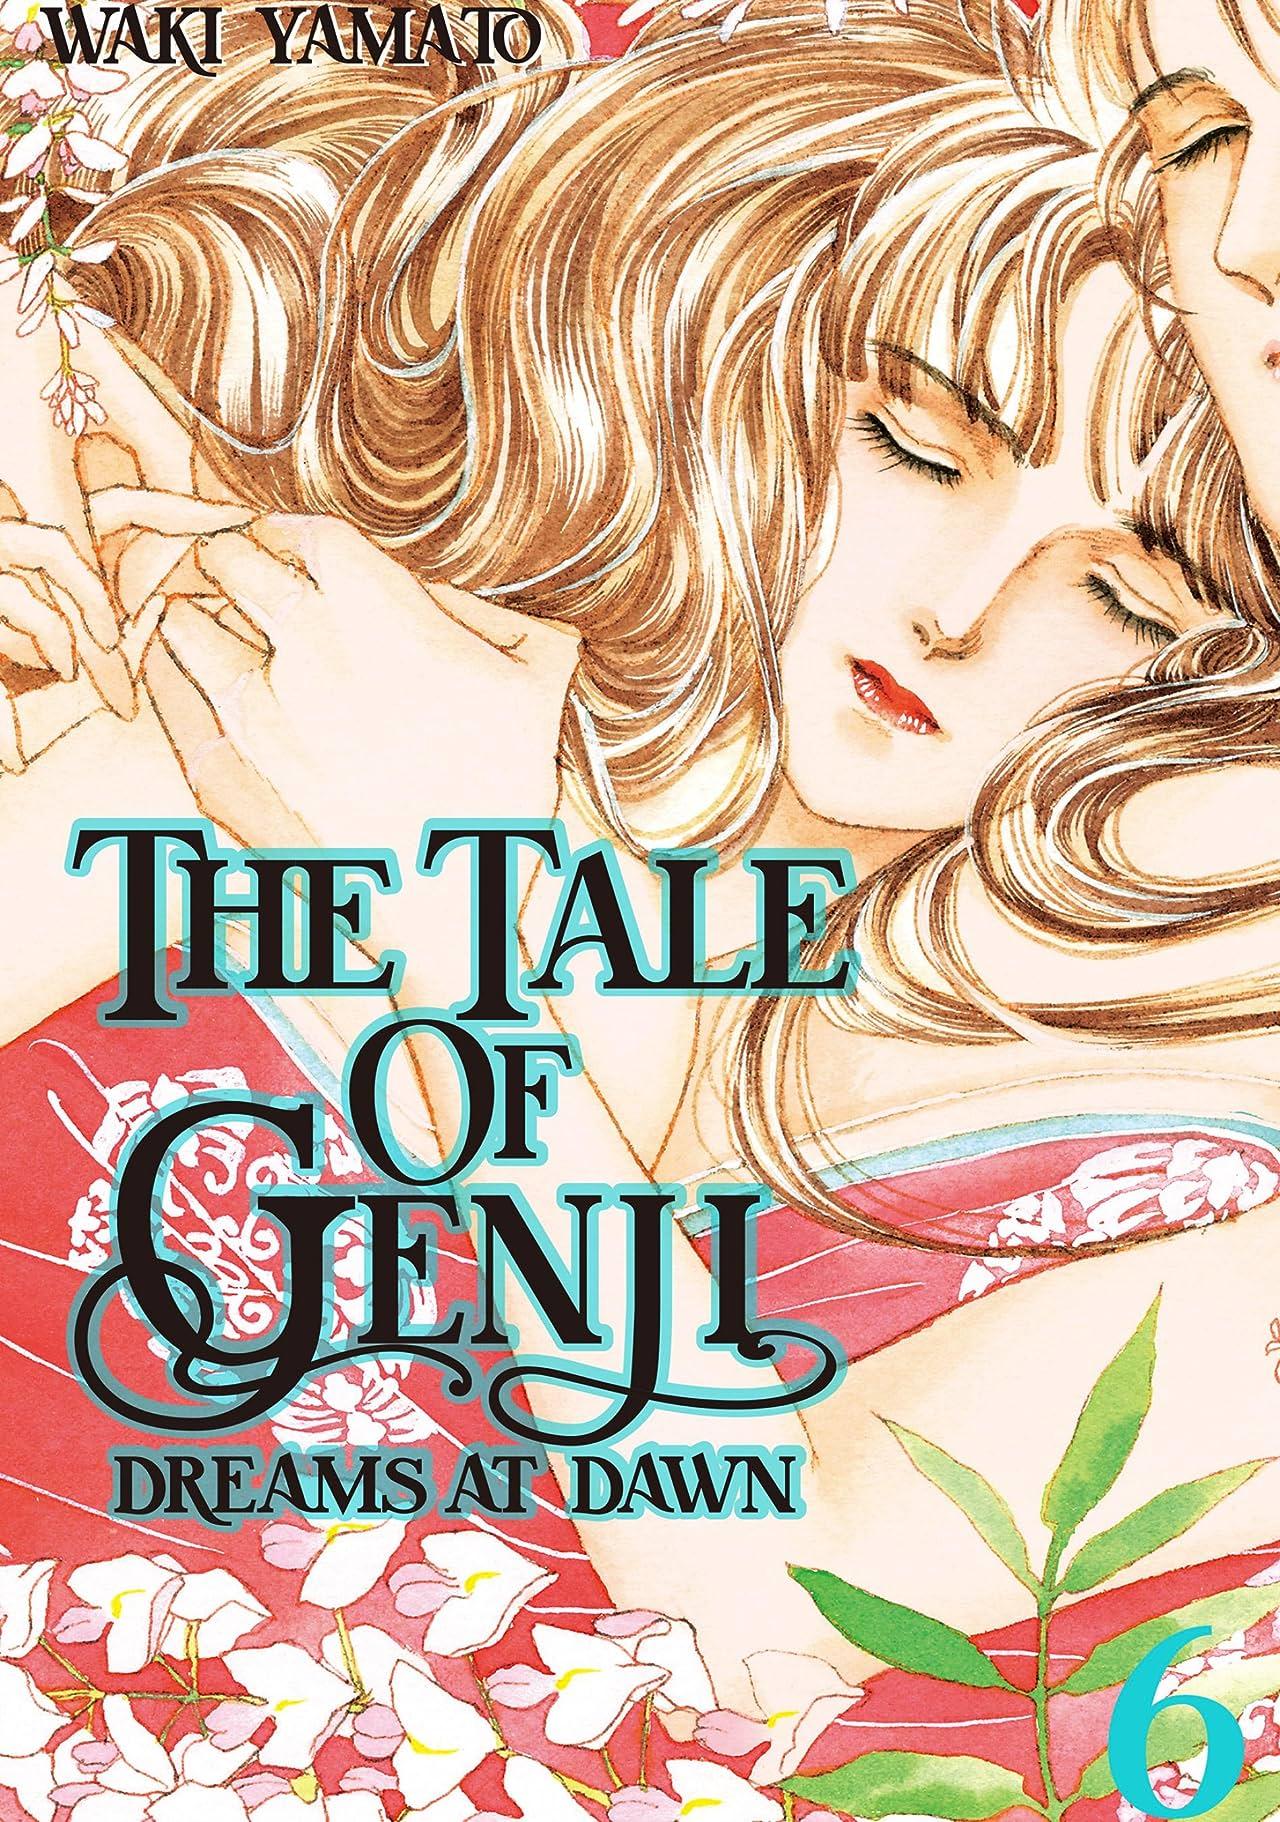 The Tale of Genji: Dreams at Dawn Vol. 6